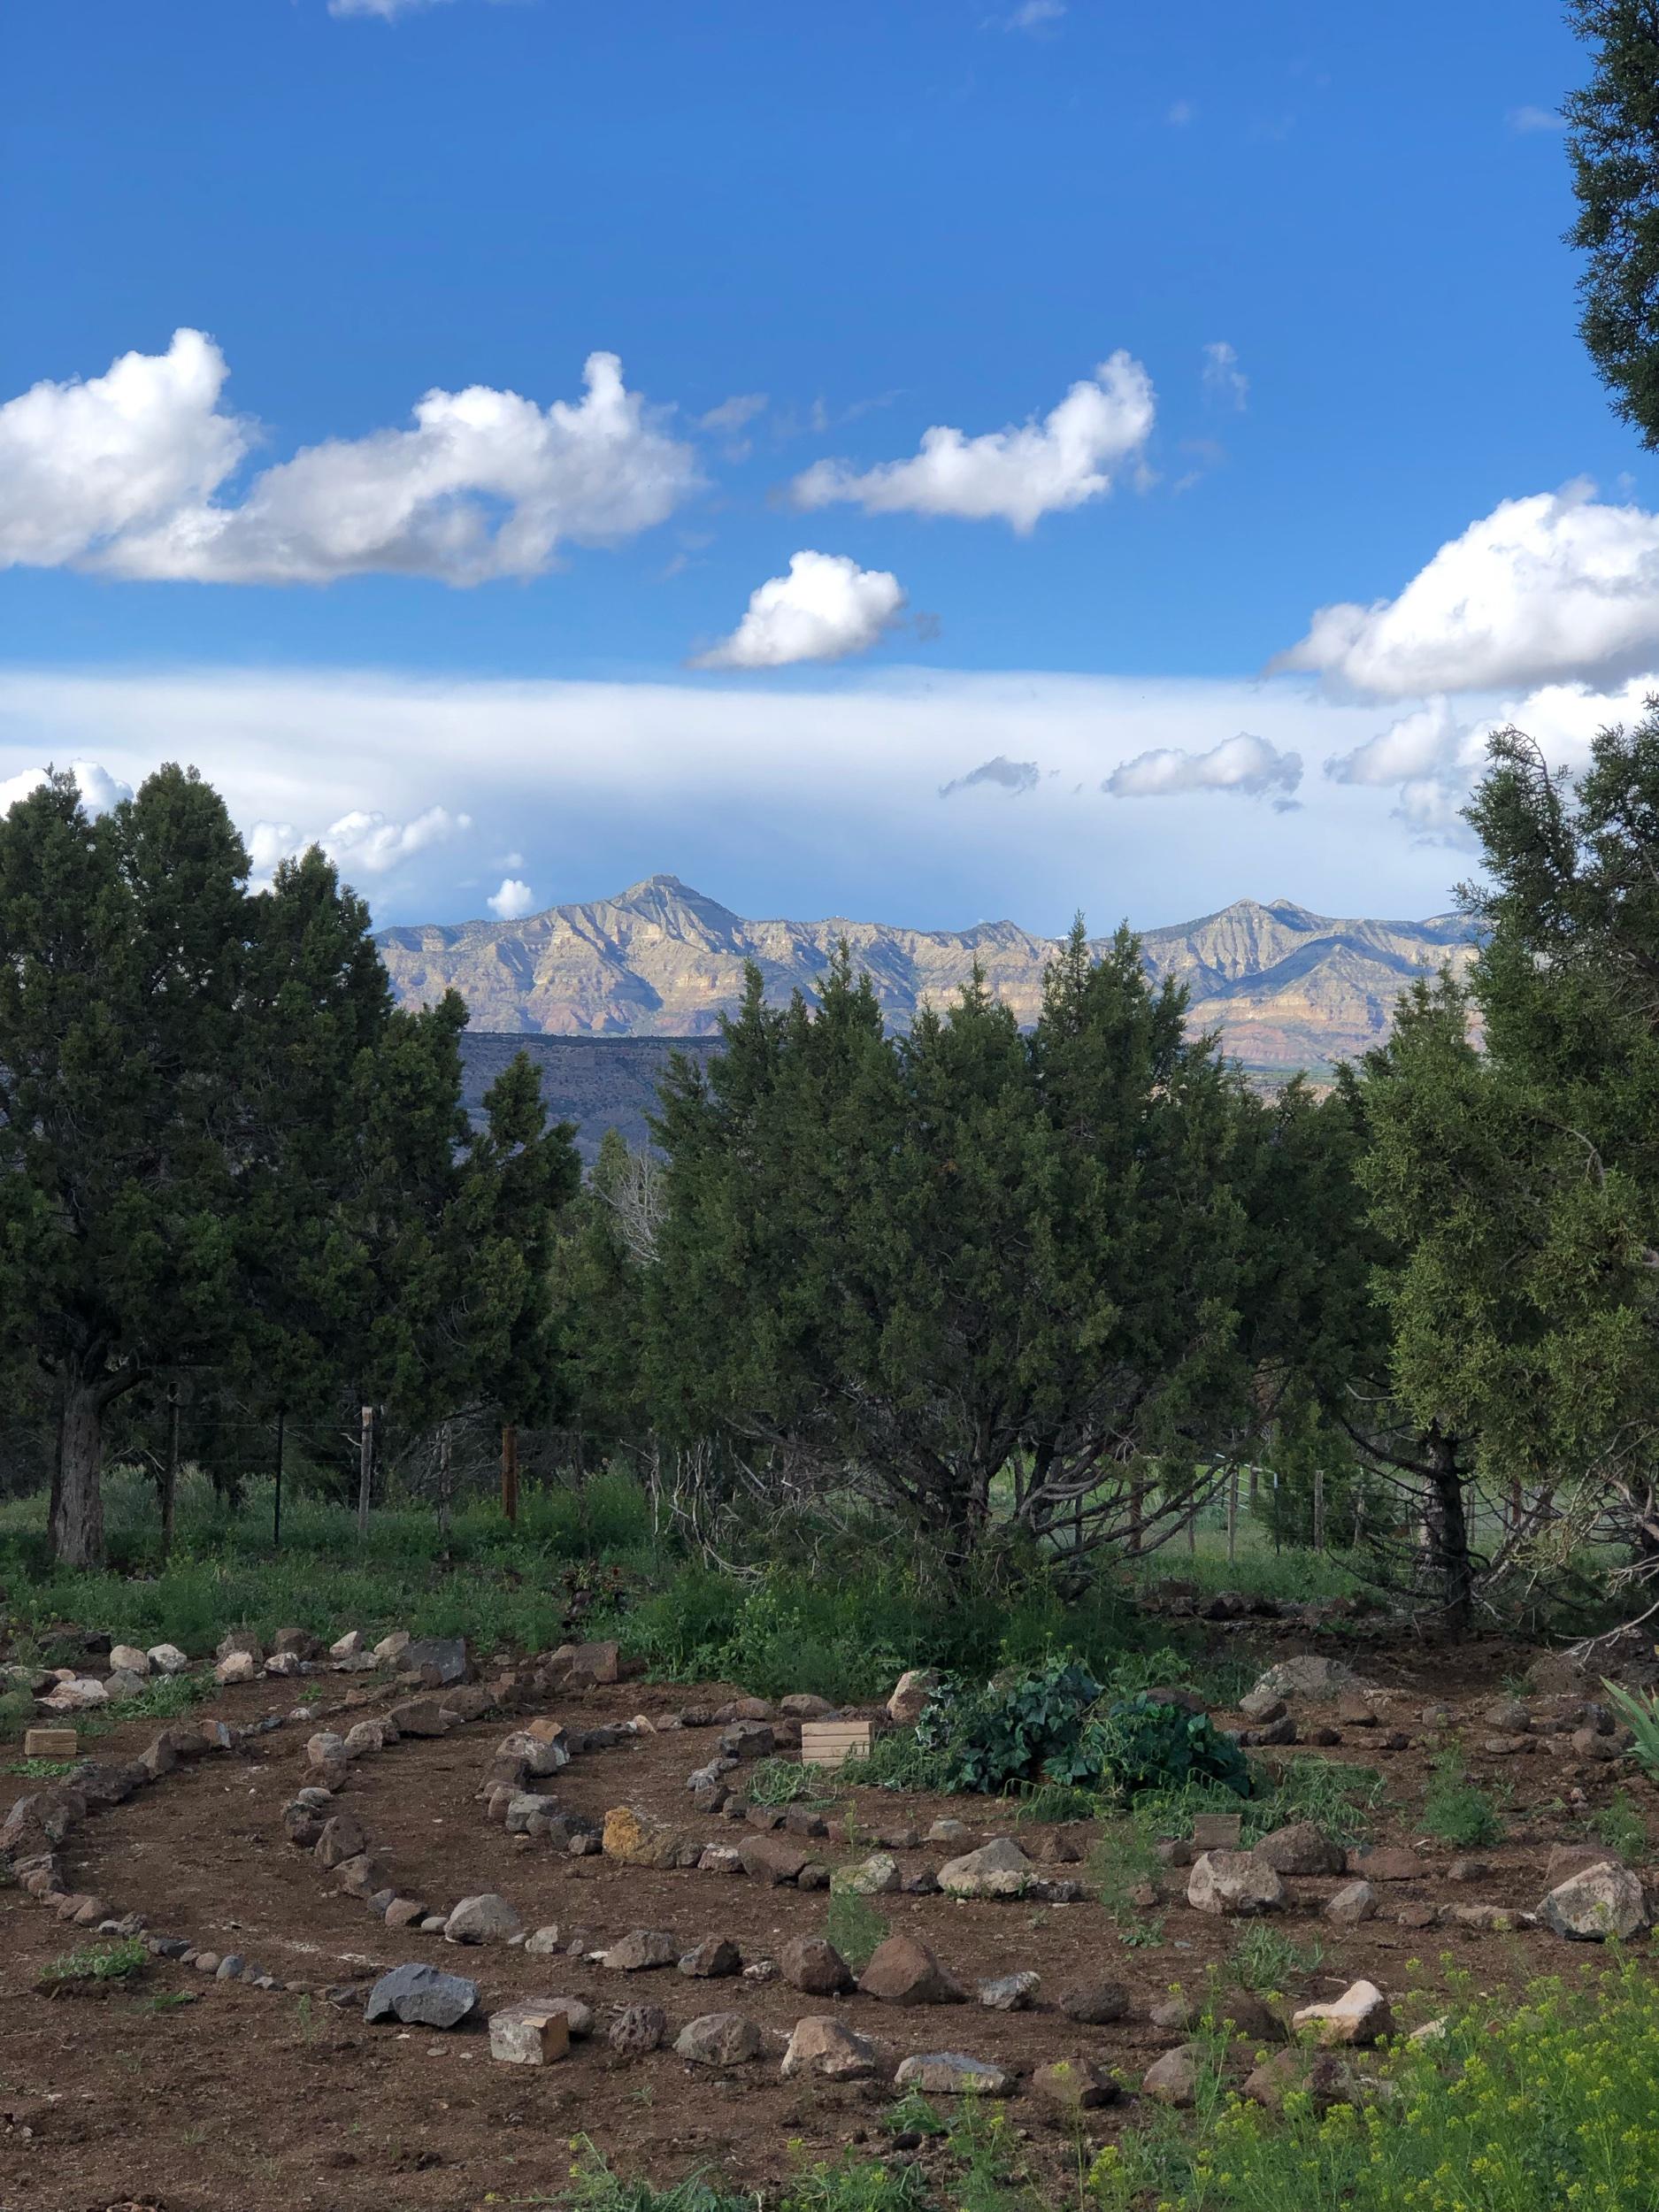 labyrinth at  six eagles haven retreat center  in mesa, colorado